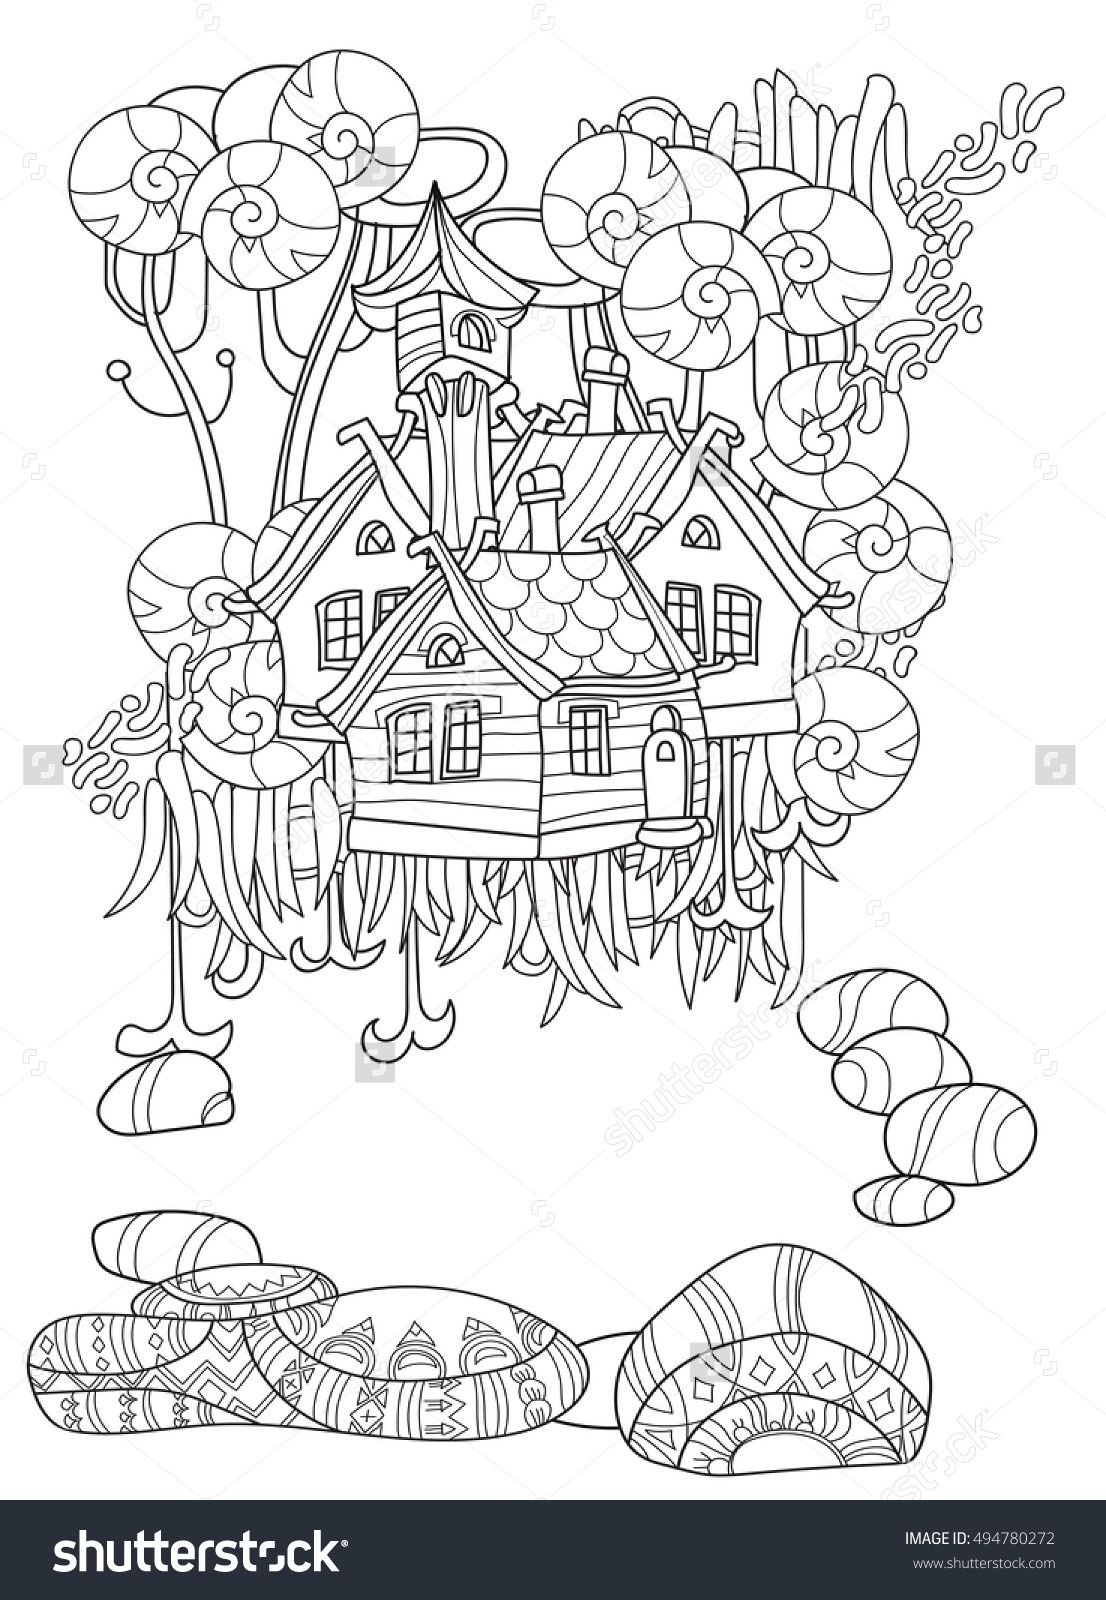 Coloring page umbrella raindrops - Doodle Outline Magic Mushrooms With Floral Ornaments Zen Art Adult Coloring